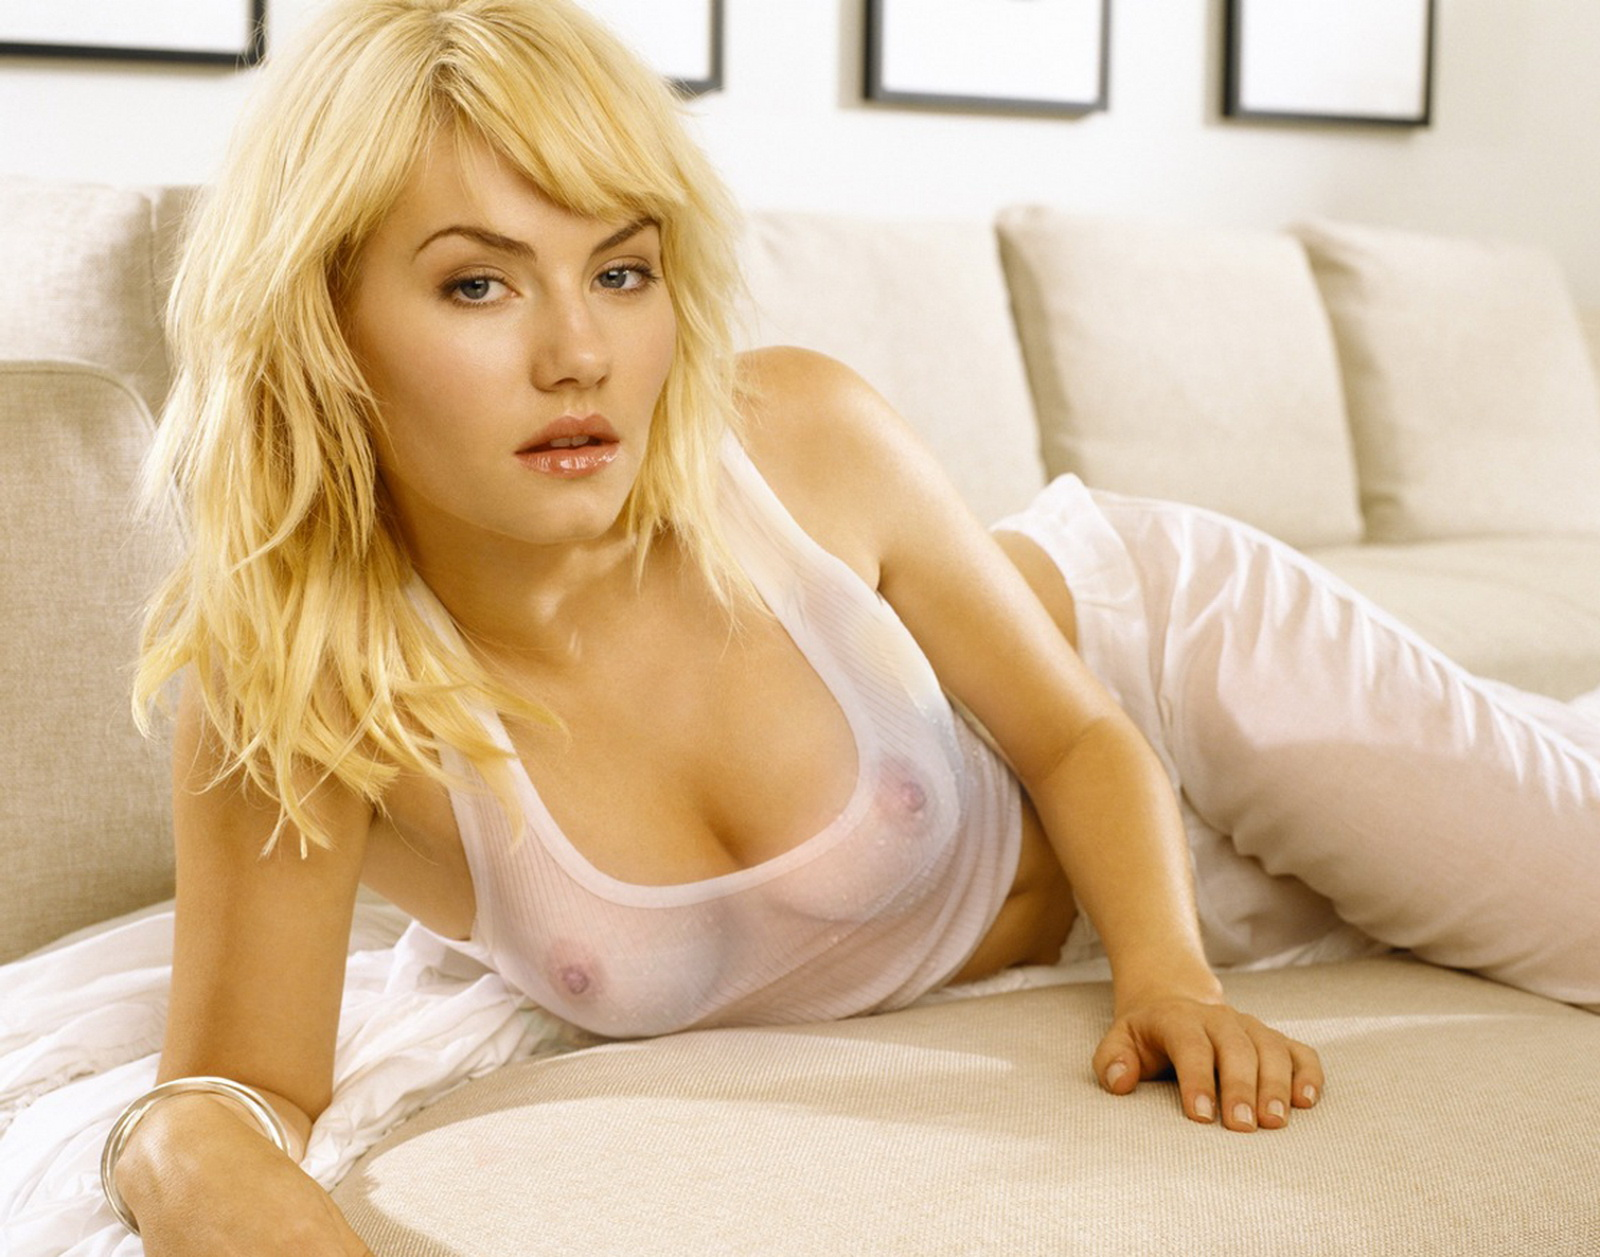 Can Elisha hot babes vagina tits